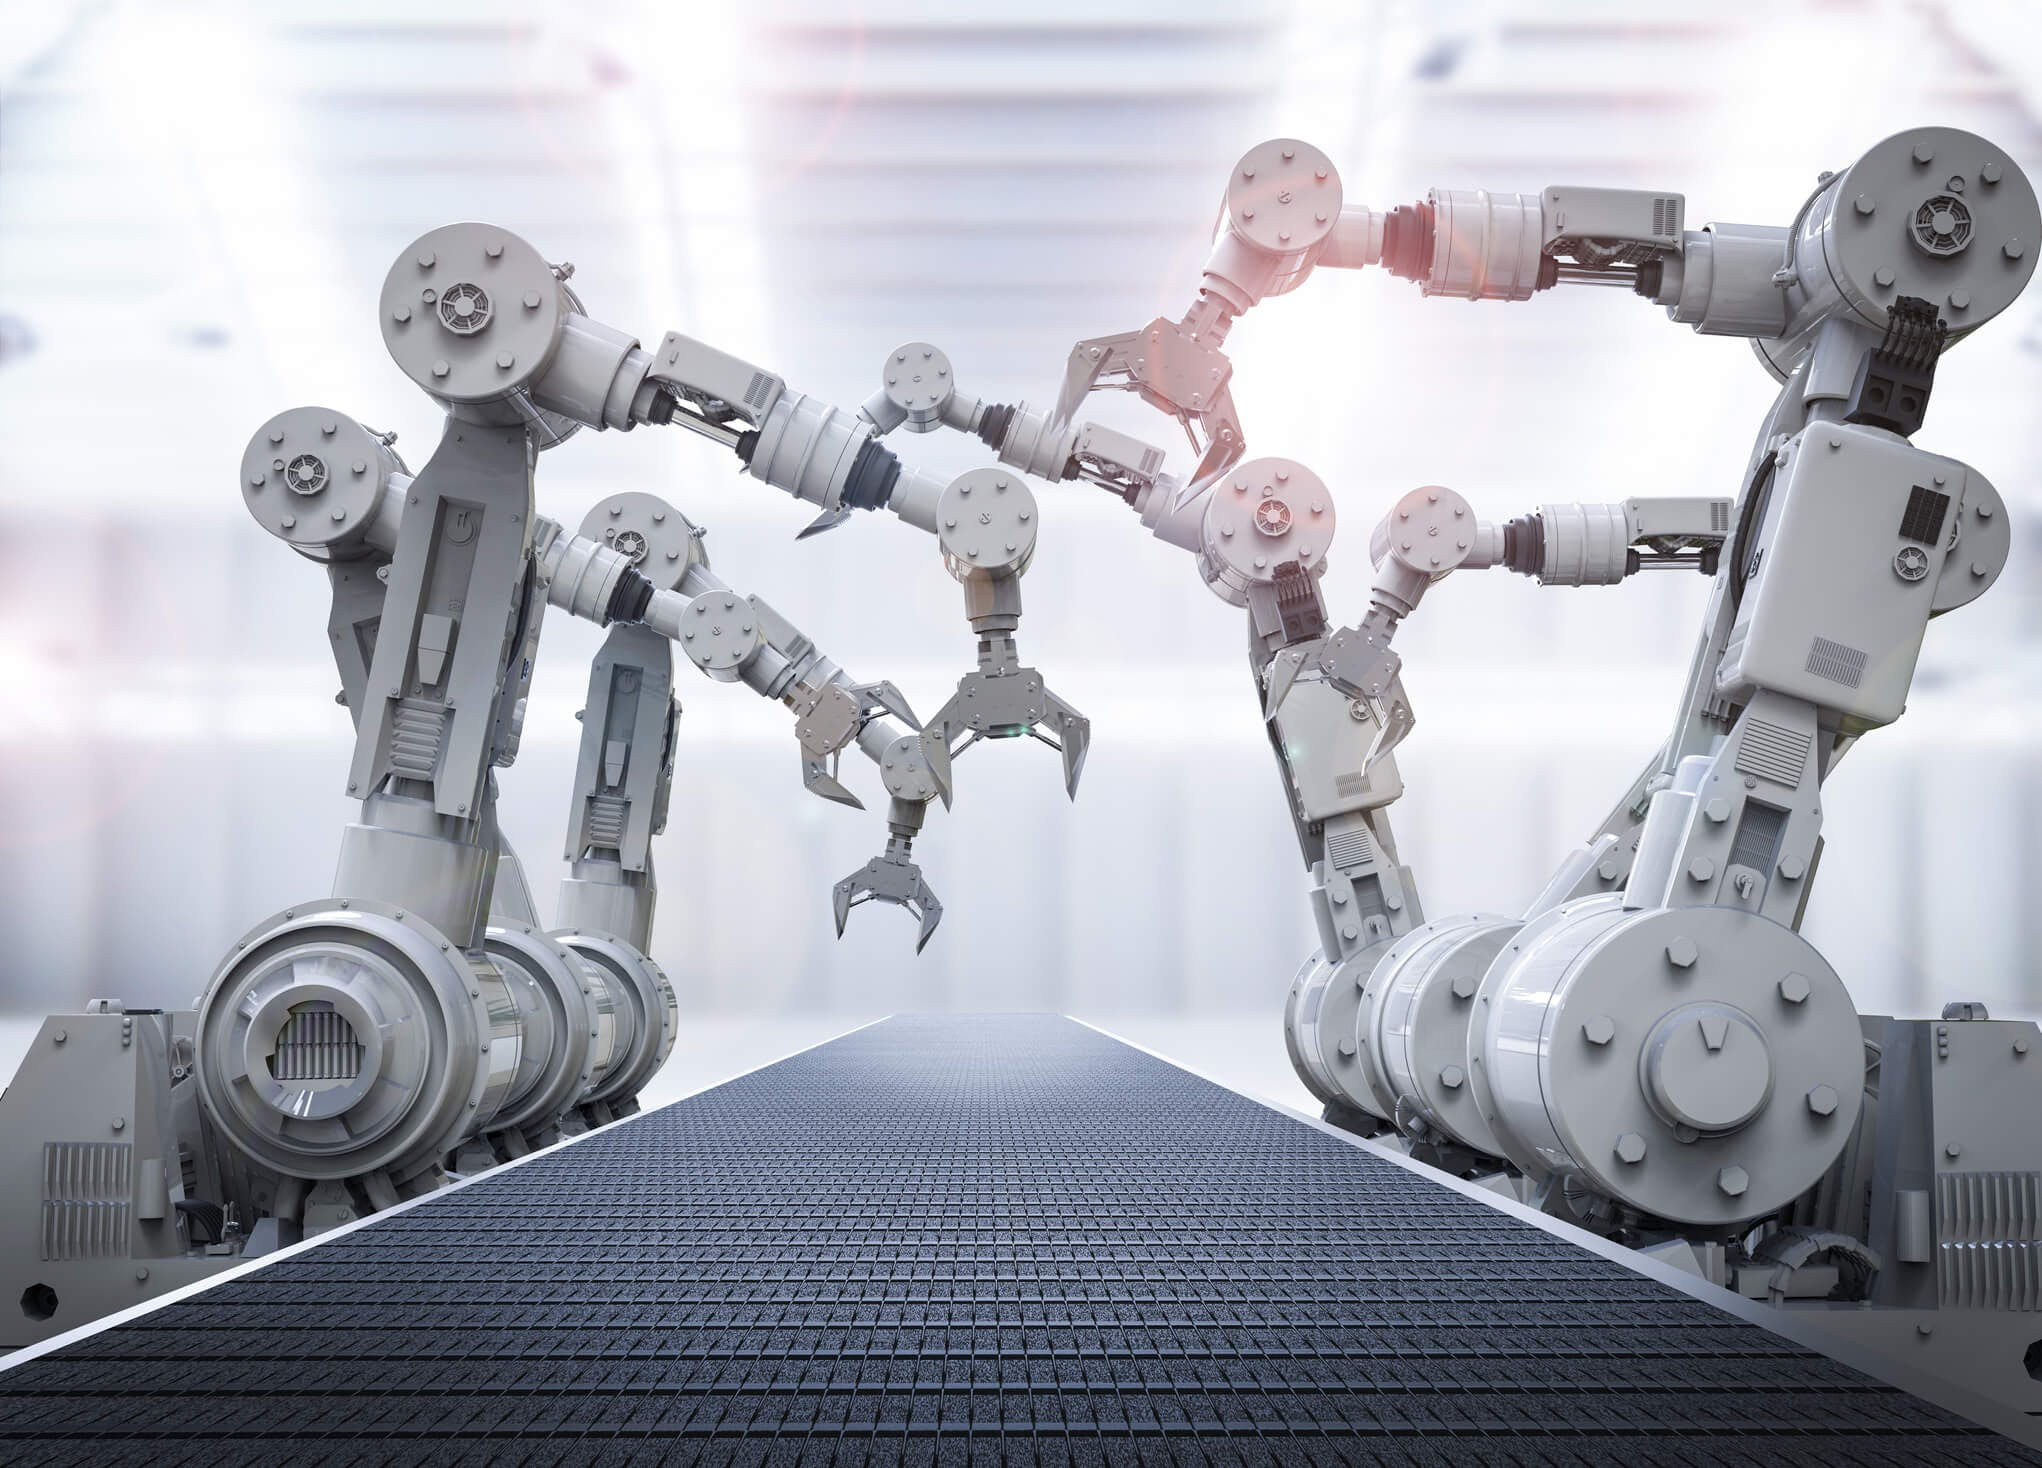 Titelbild-Fliessband-Roboter-Arme-Rendering-iStock-612375398-PhonlamaiPhoto